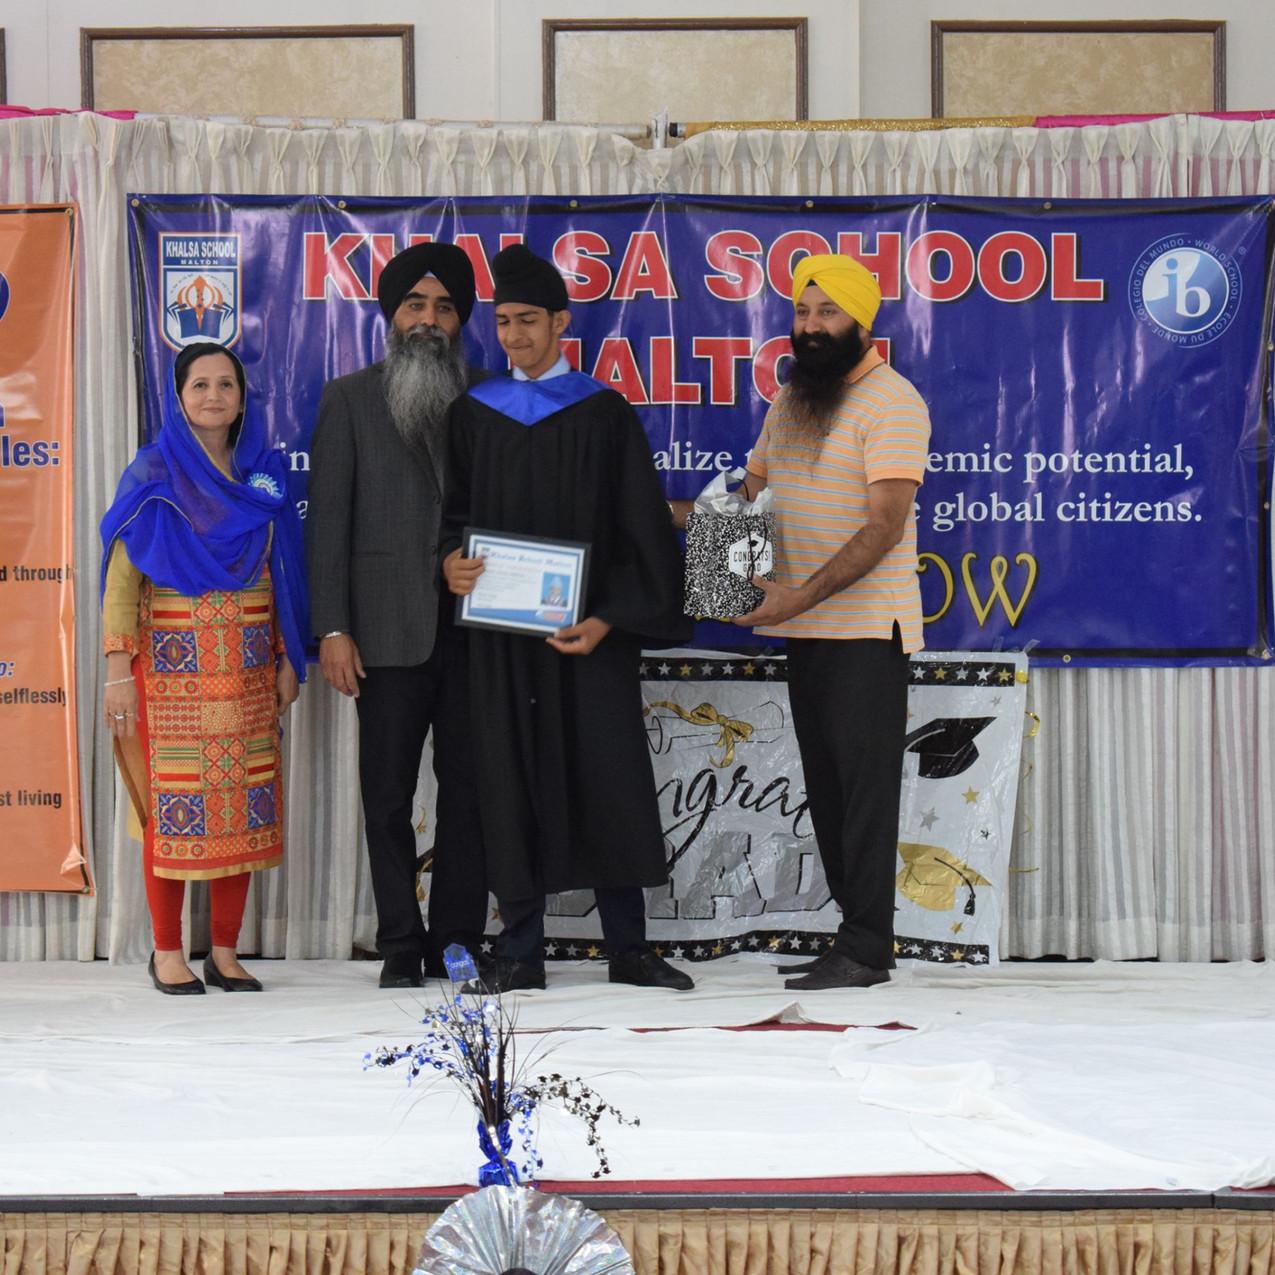 Khalsa School Malton Graduation Day